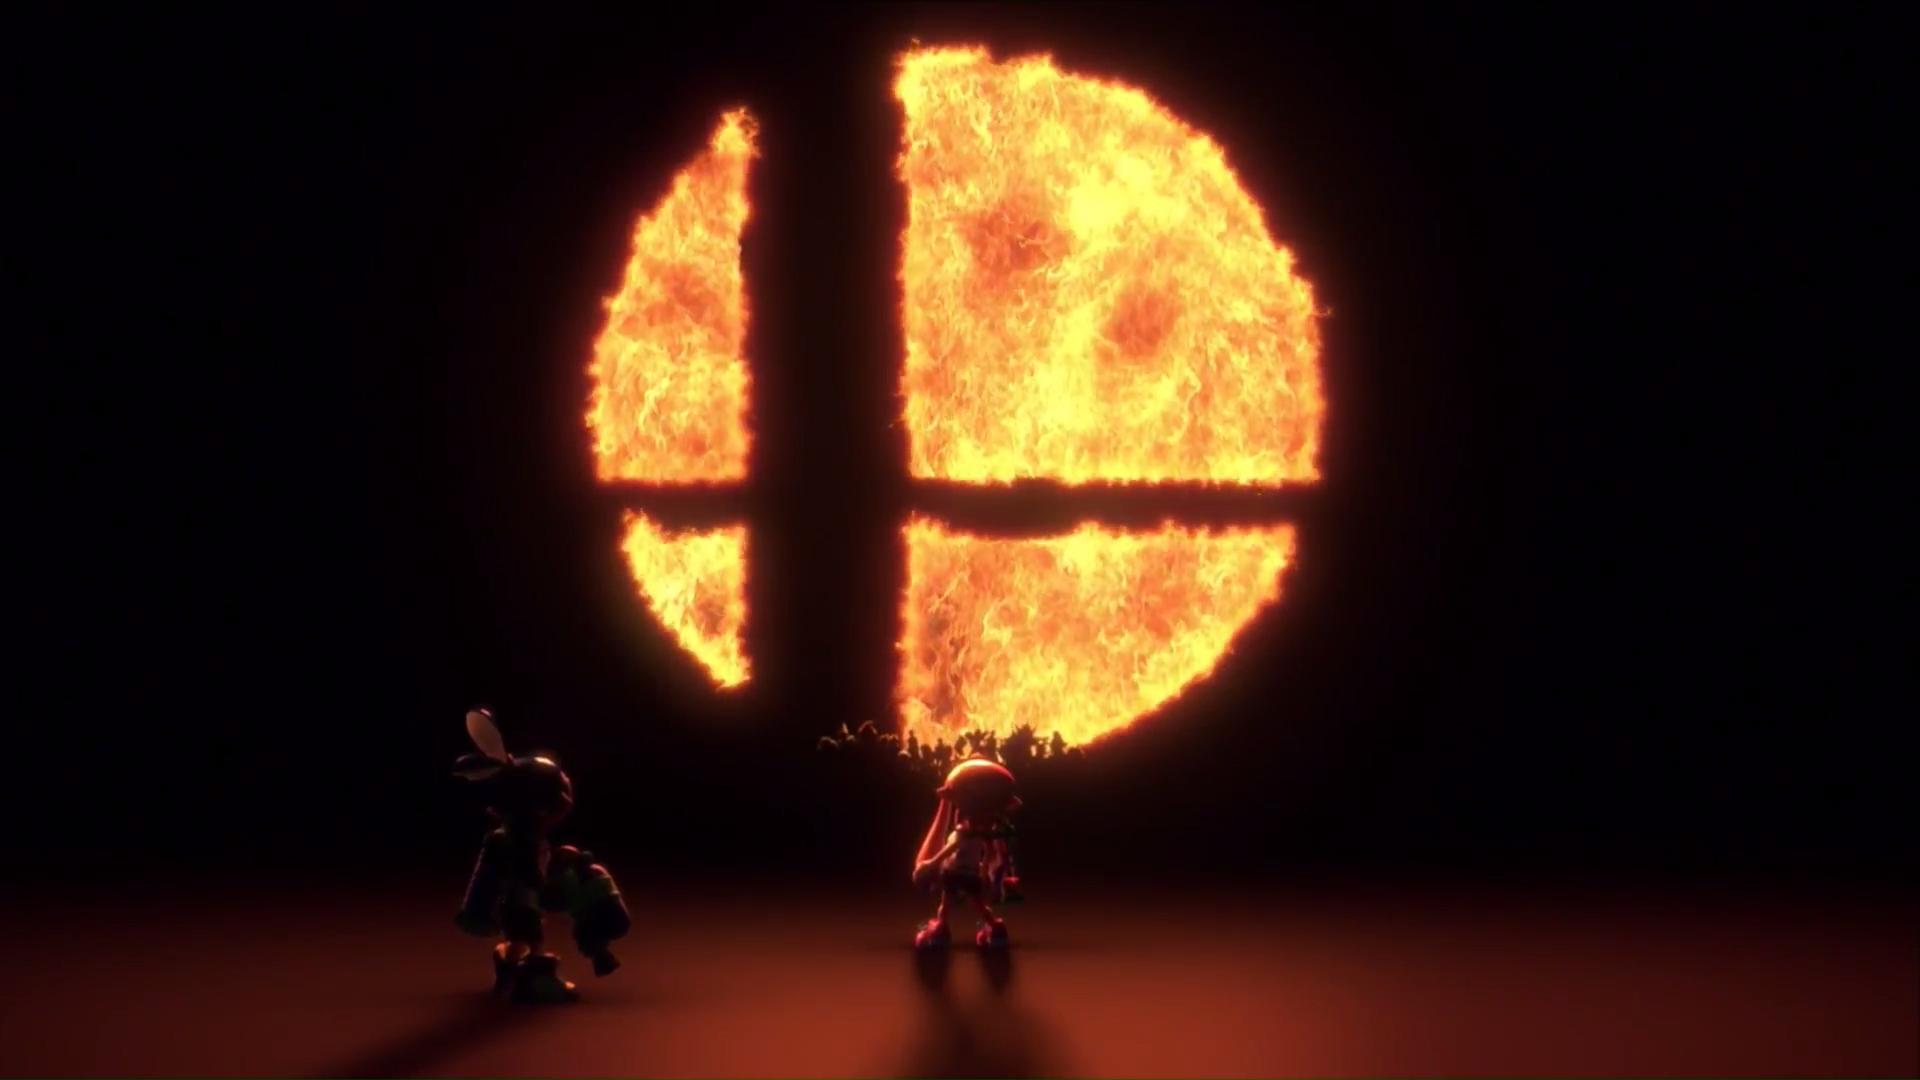 Super Smash Bros Officially Teased For Nintendo Switch Shacknews